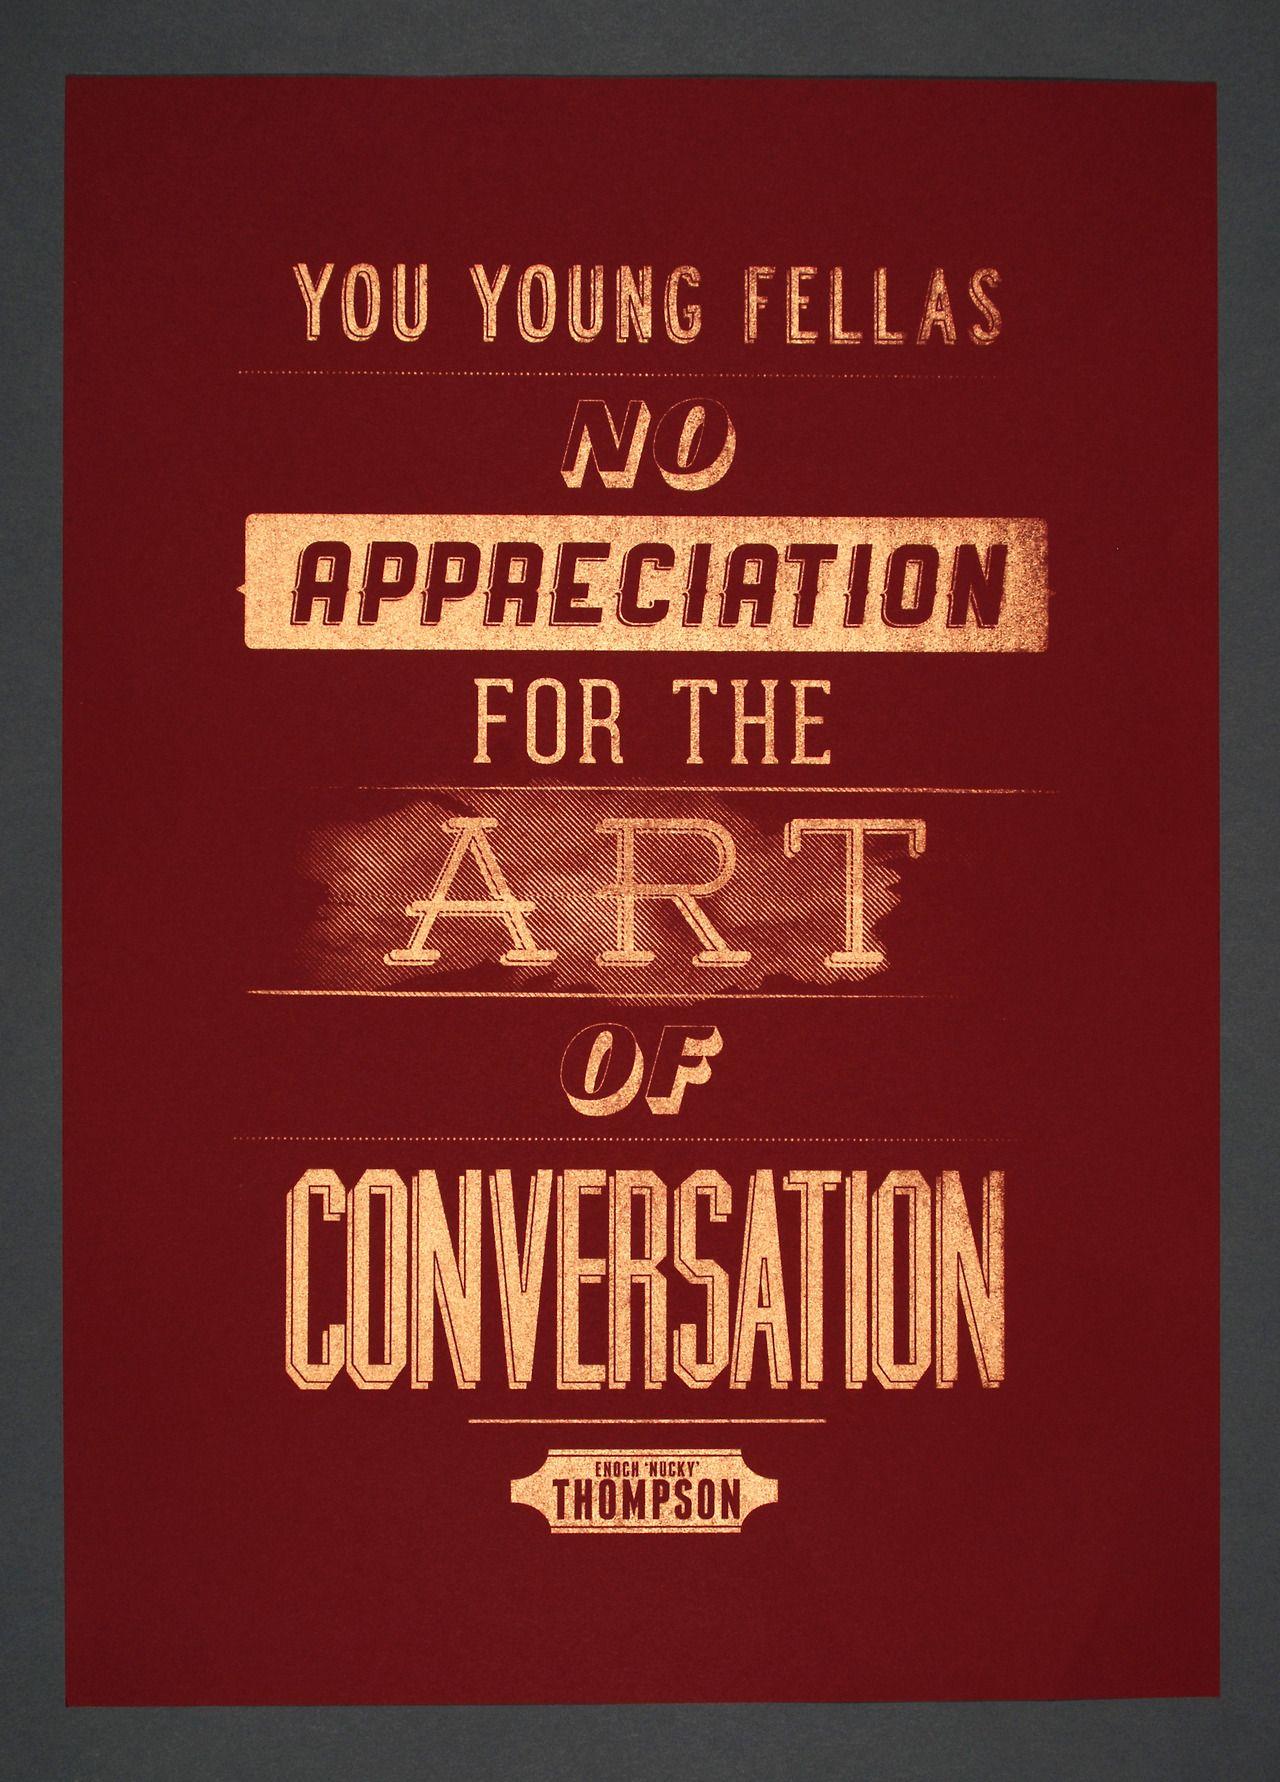 You young fellas